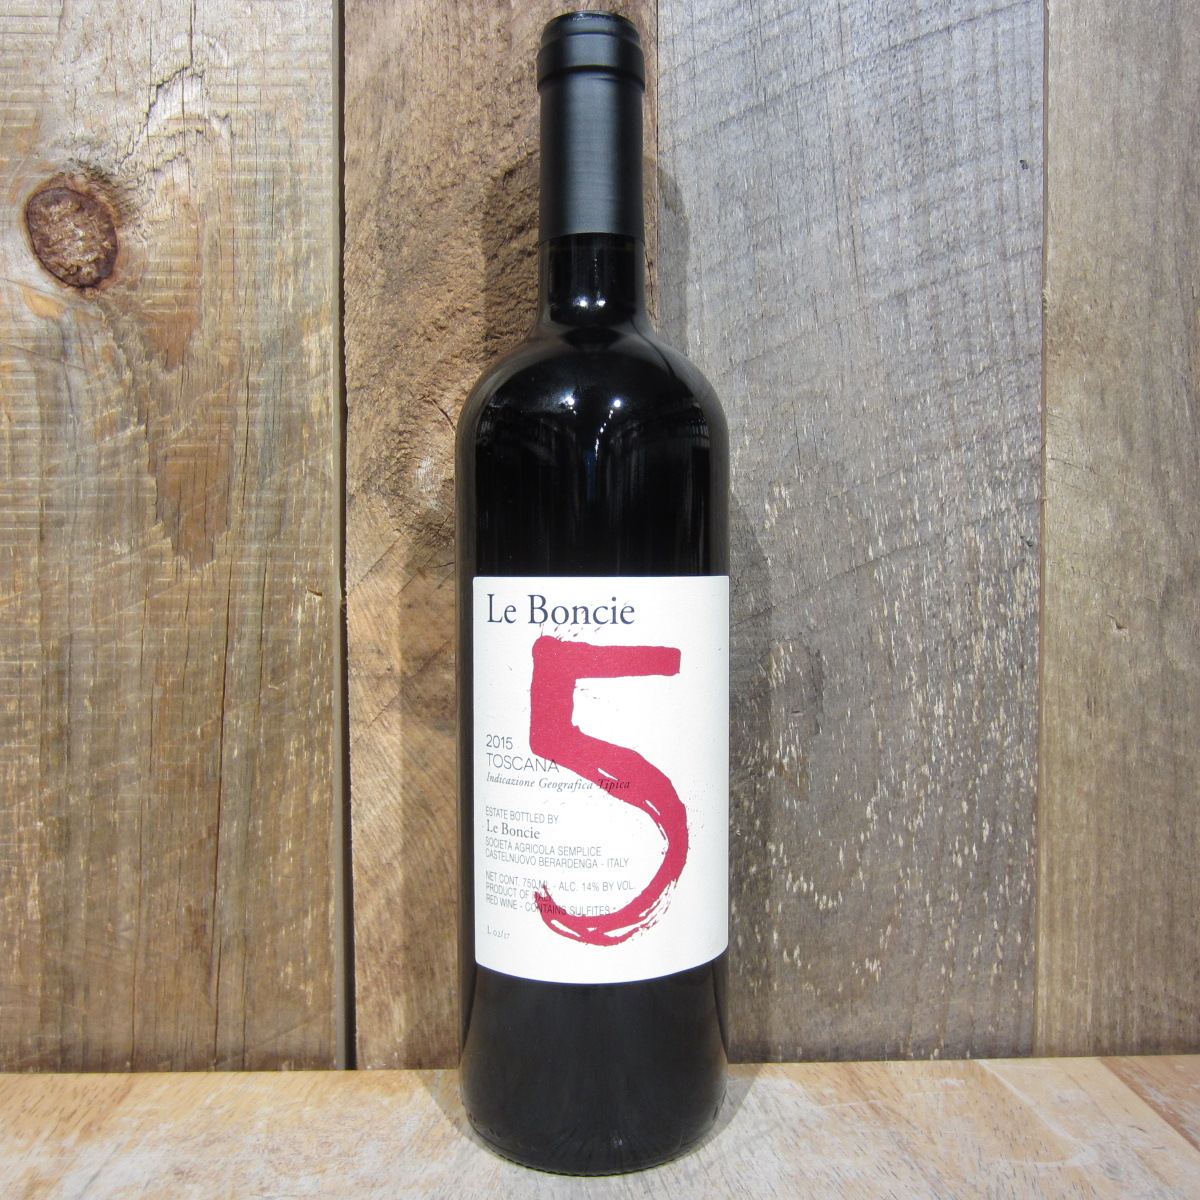 Le Boncie Cinque Rosso di  Toscana 2015 750ml